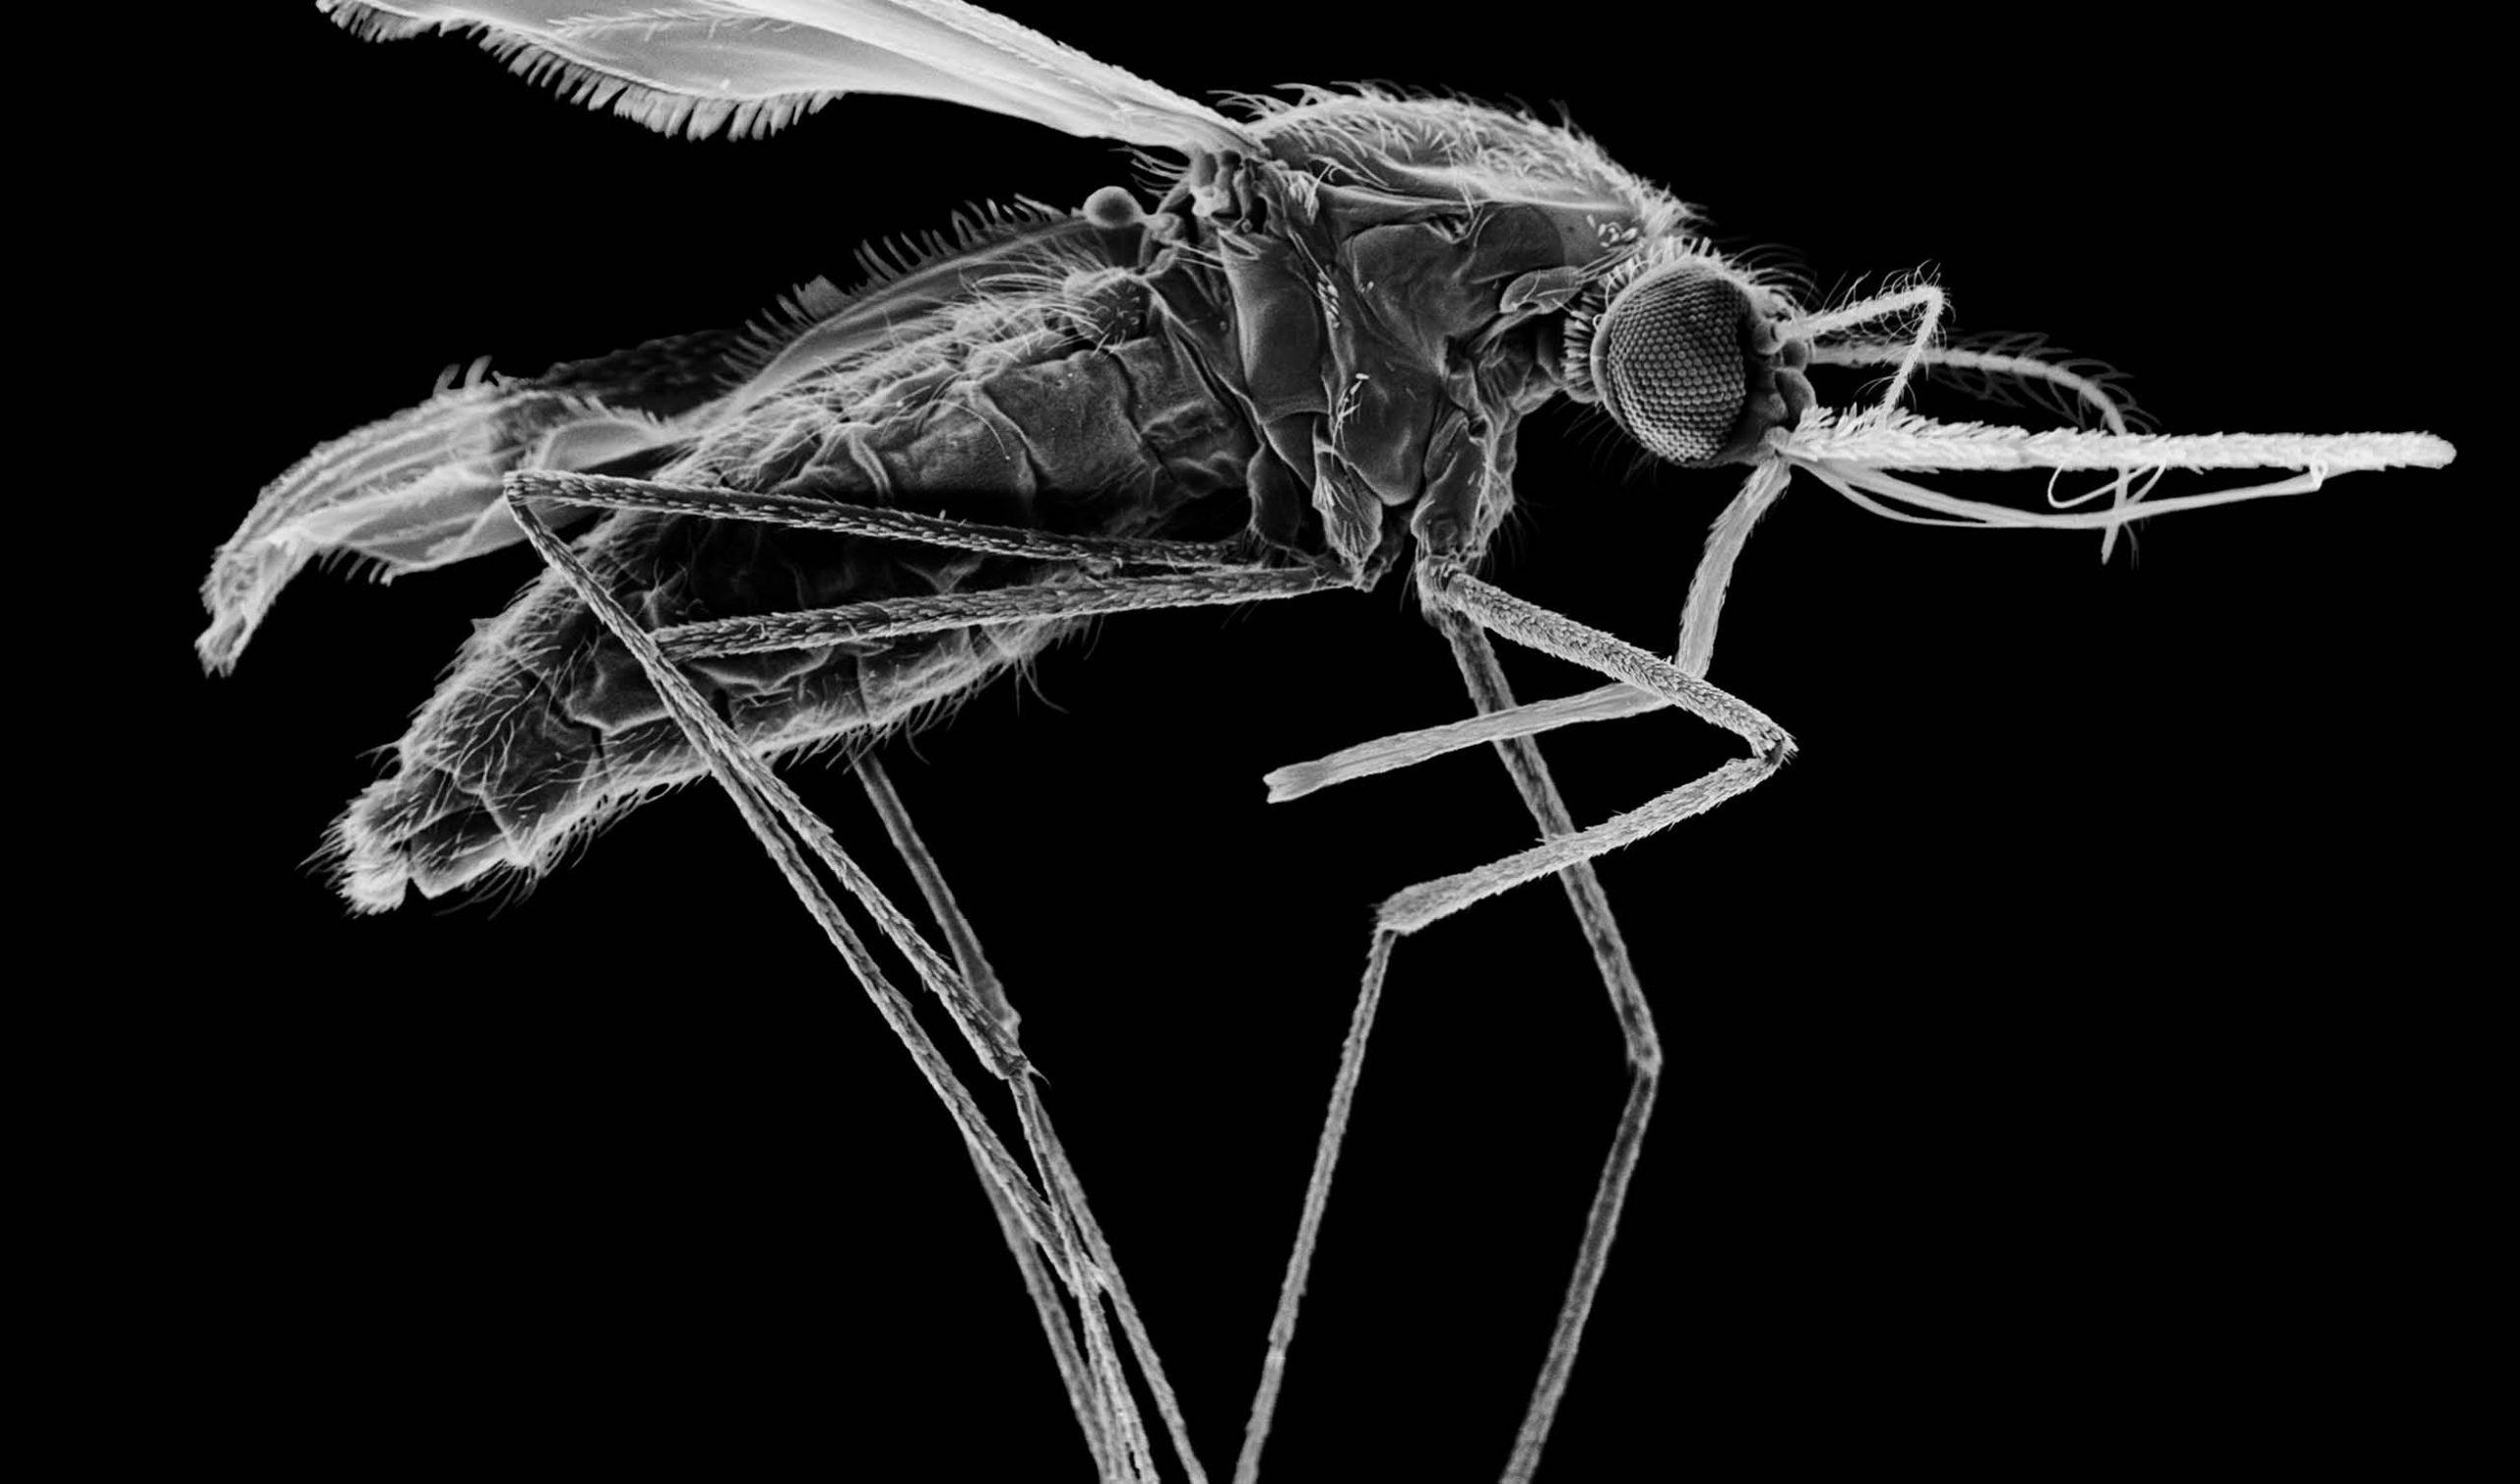 Global fight against malaria, sanger institute case studies, world malaria day